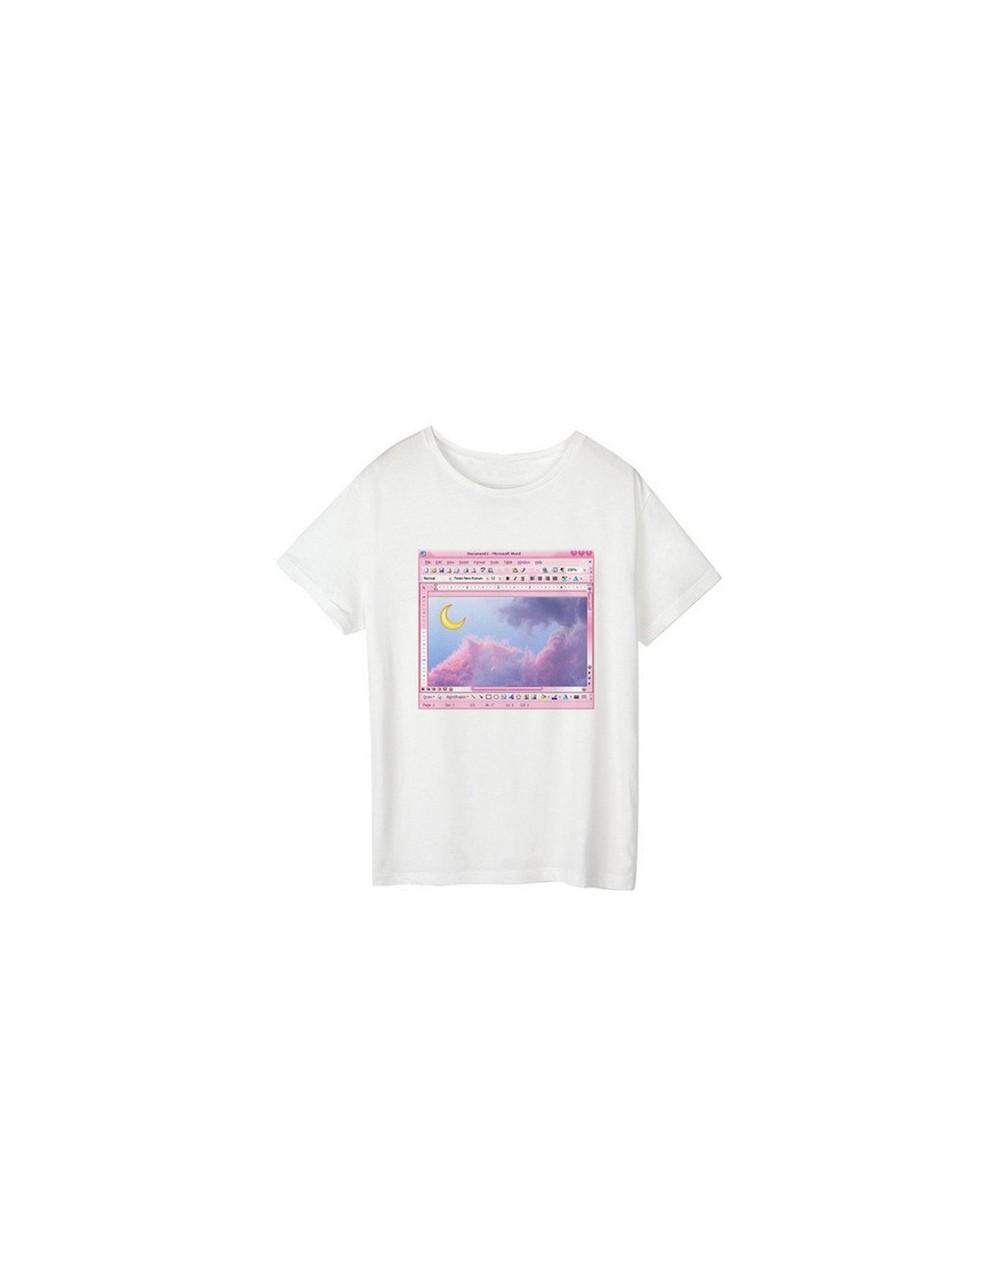 Sailor Moon Summer New Fashion T Shirt Women Harajuku Short Sleeve Fun Ulzzang T-Shirt Cute Cat Tshirt Cartoon Top Tees Fema...